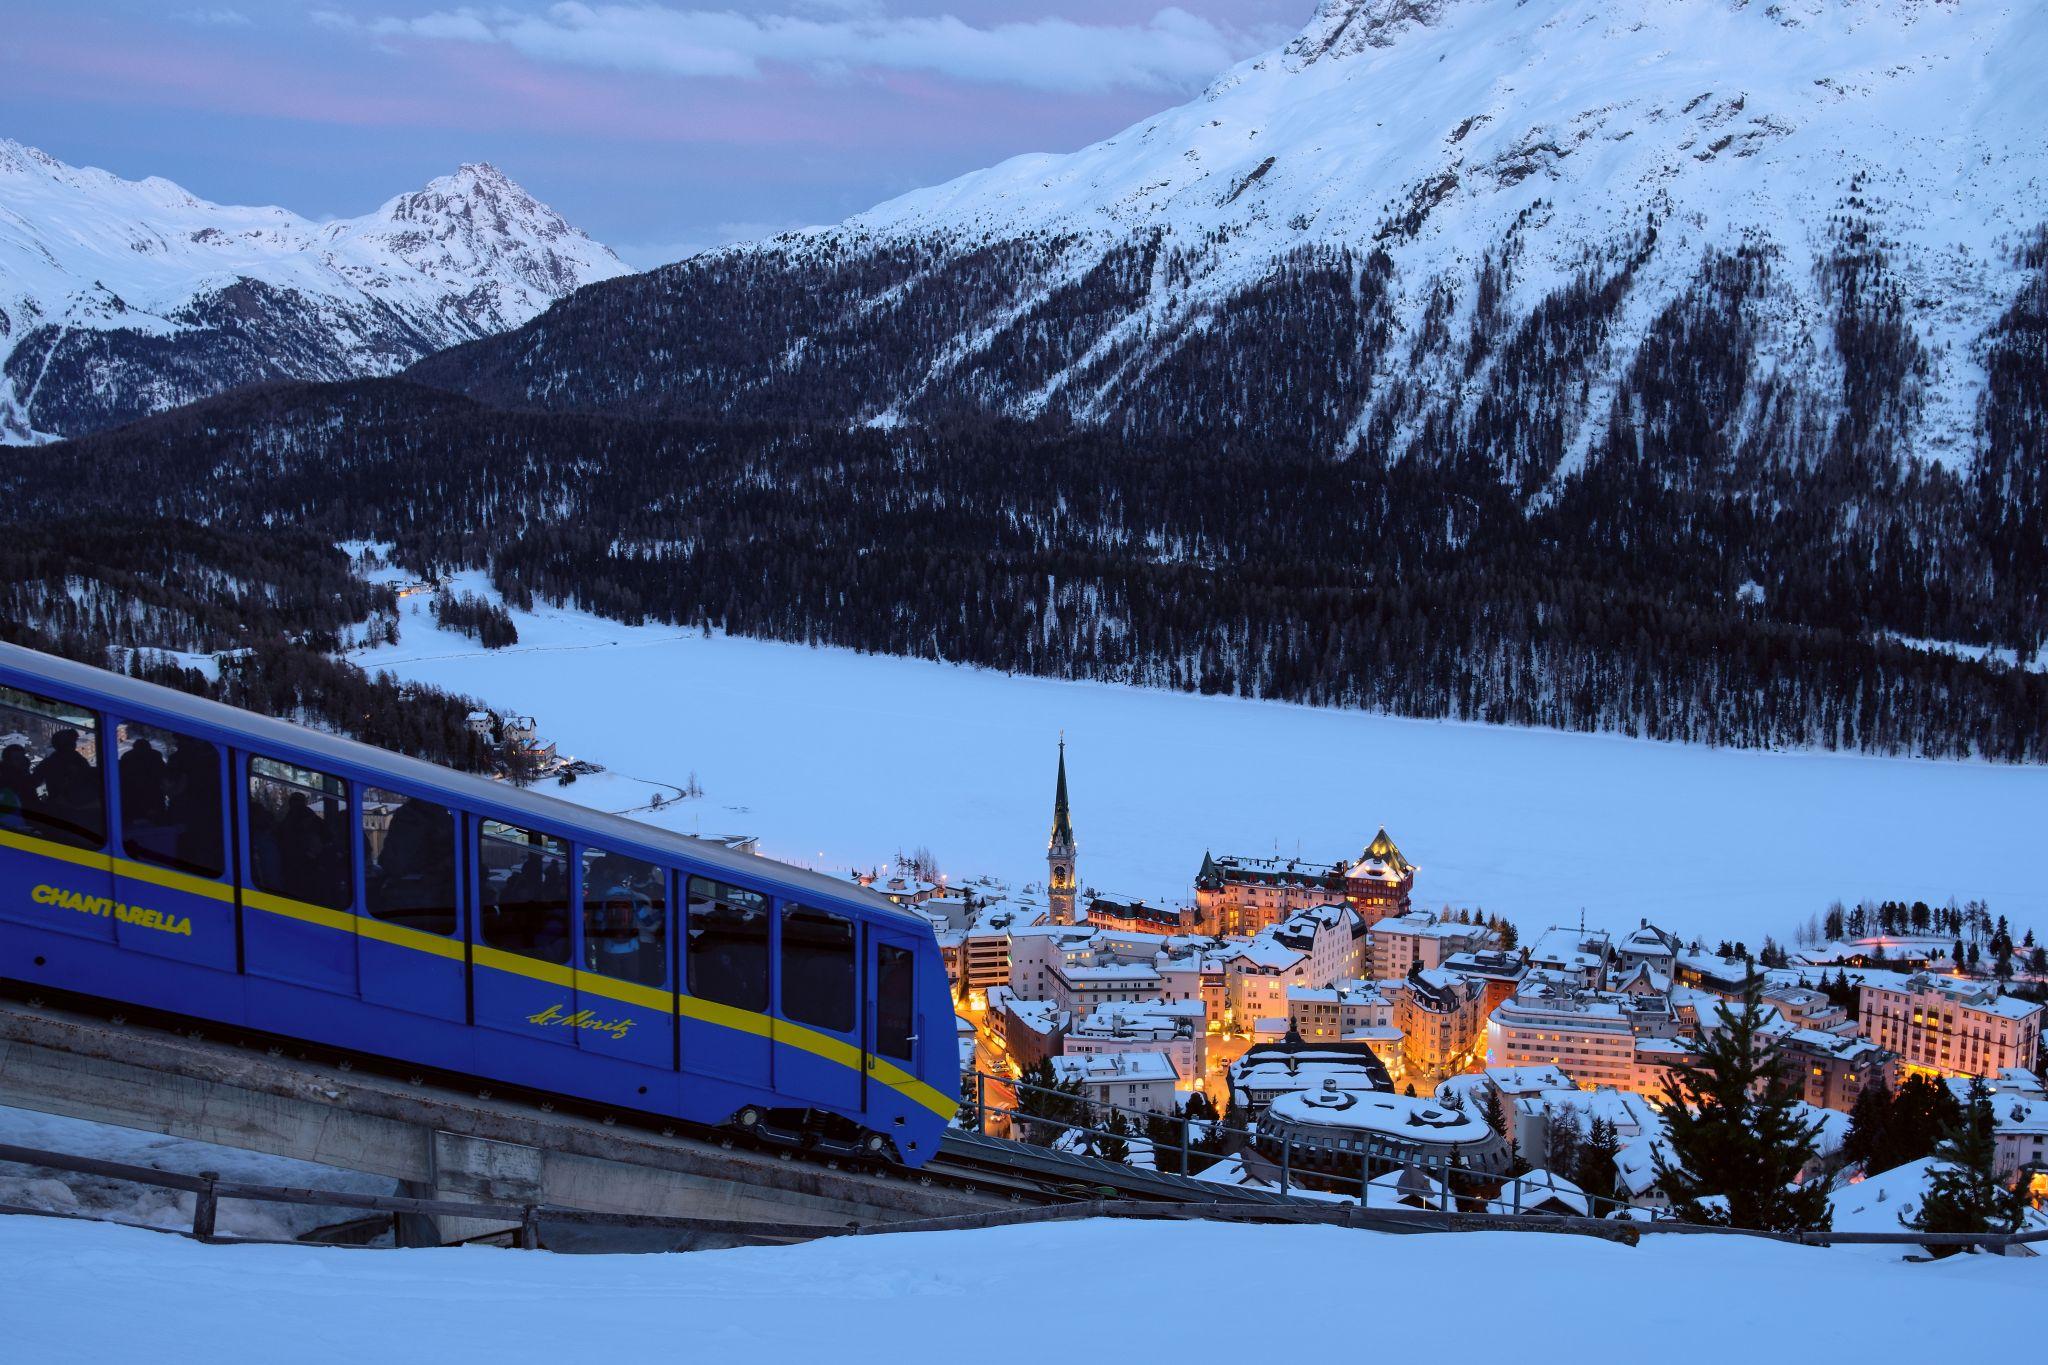 Finicular Chantarella-St.Moritz, Switzerland